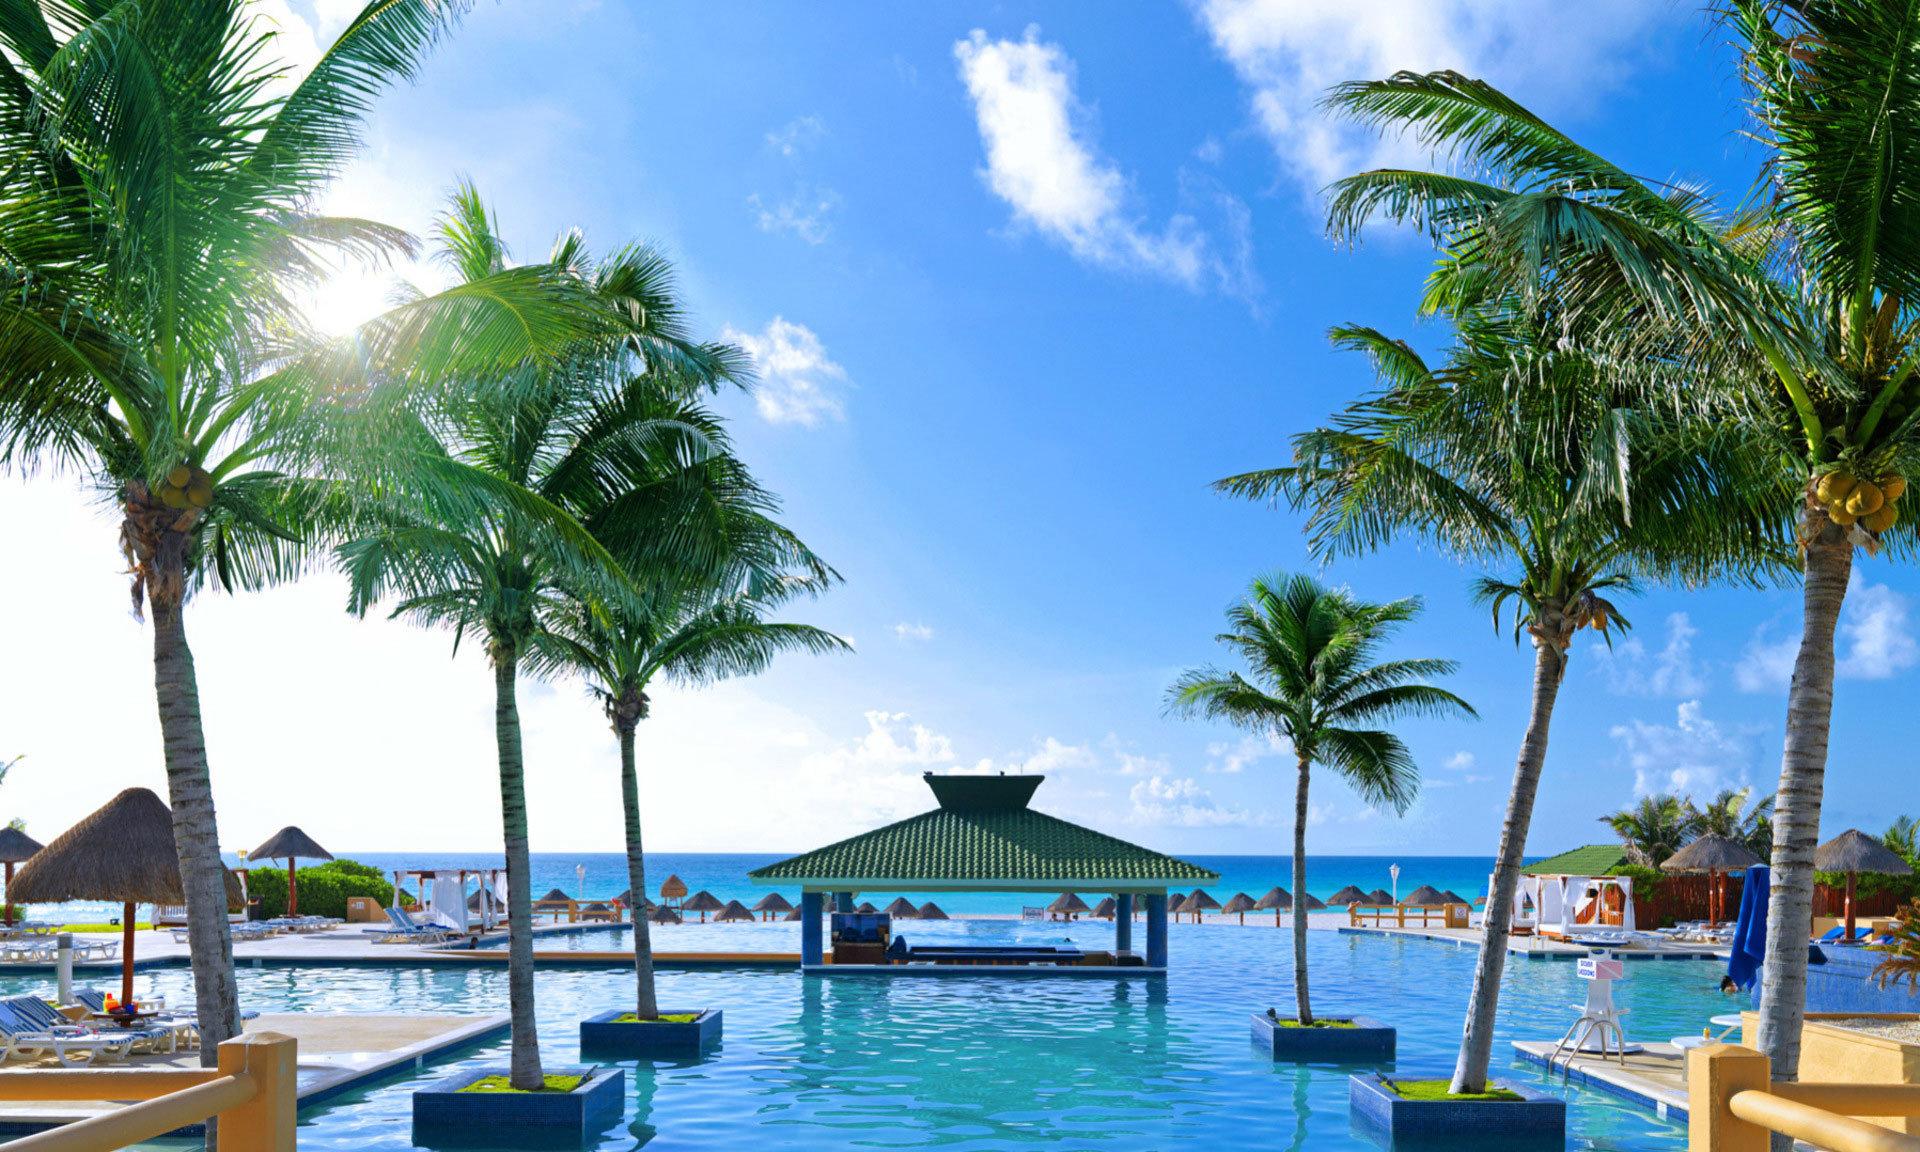 tree sky palm water umbrella chair Resort Beach leisure caribbean swimming pool Pool lined arecales plant tropics resort town Lagoon lawn palm family Sea Villa shade sunny swimming